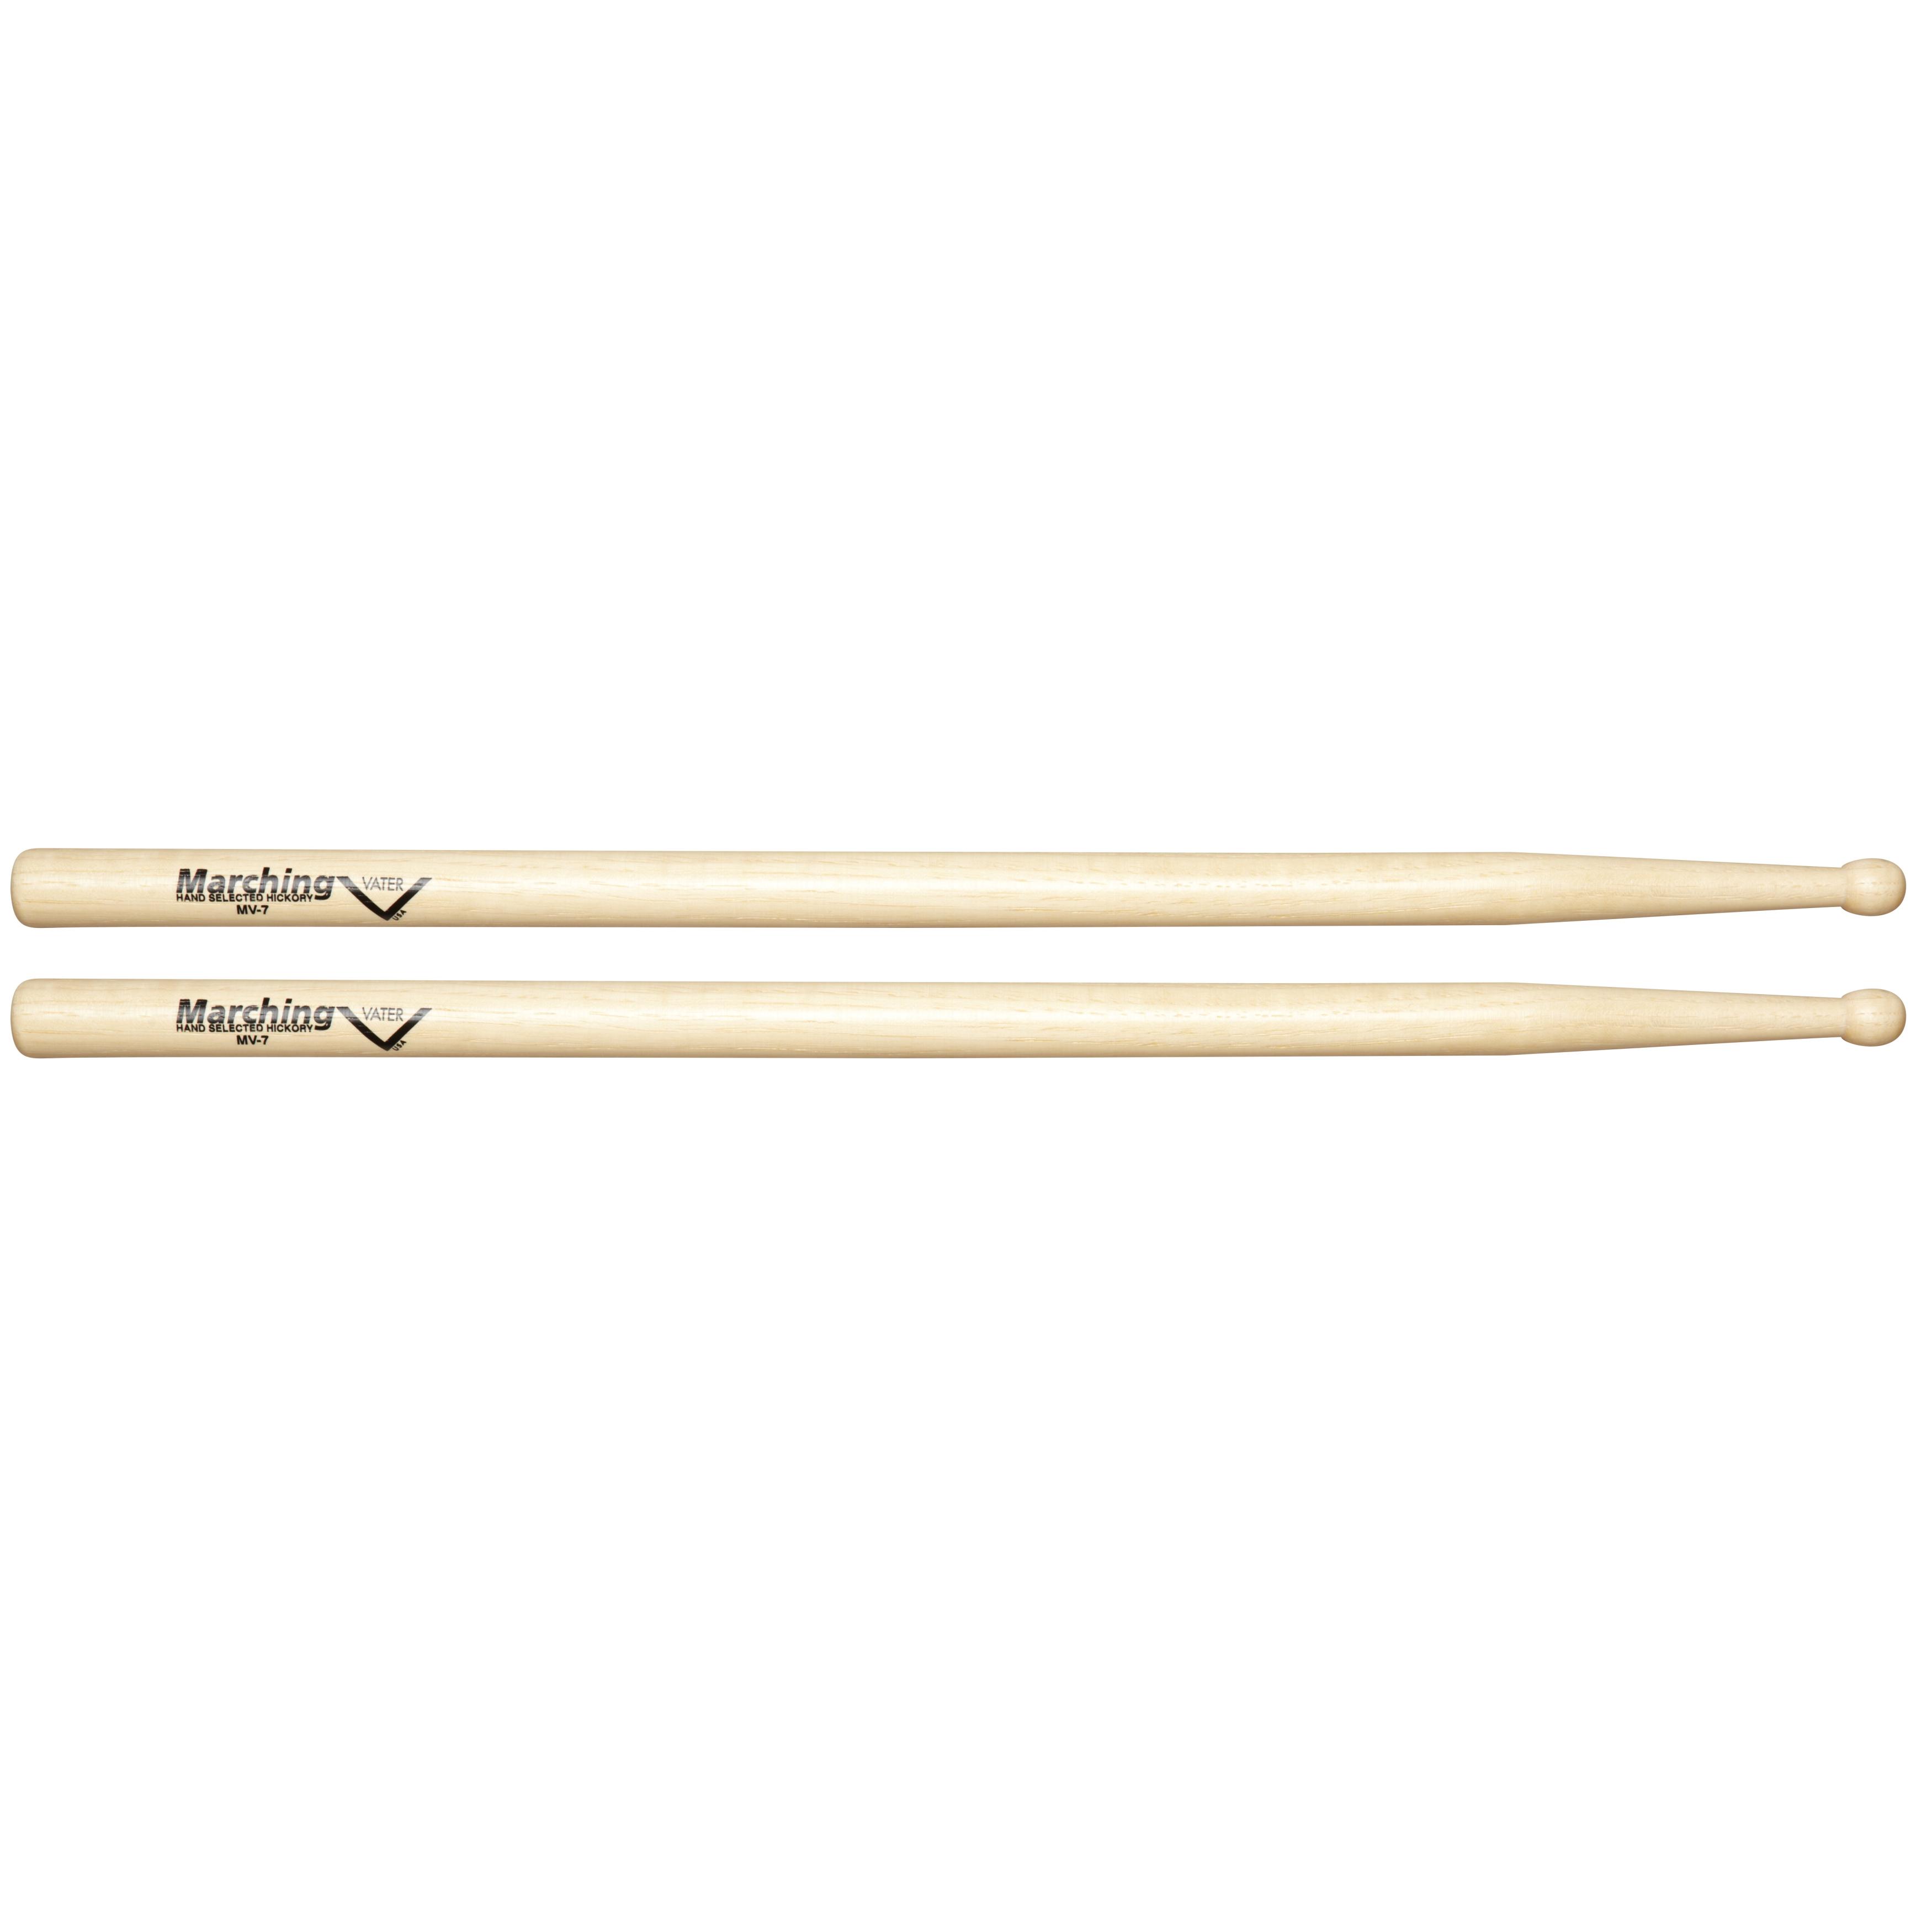 vater mv7 marching drum sticks with barrel tip pair musical instruments. Black Bedroom Furniture Sets. Home Design Ideas